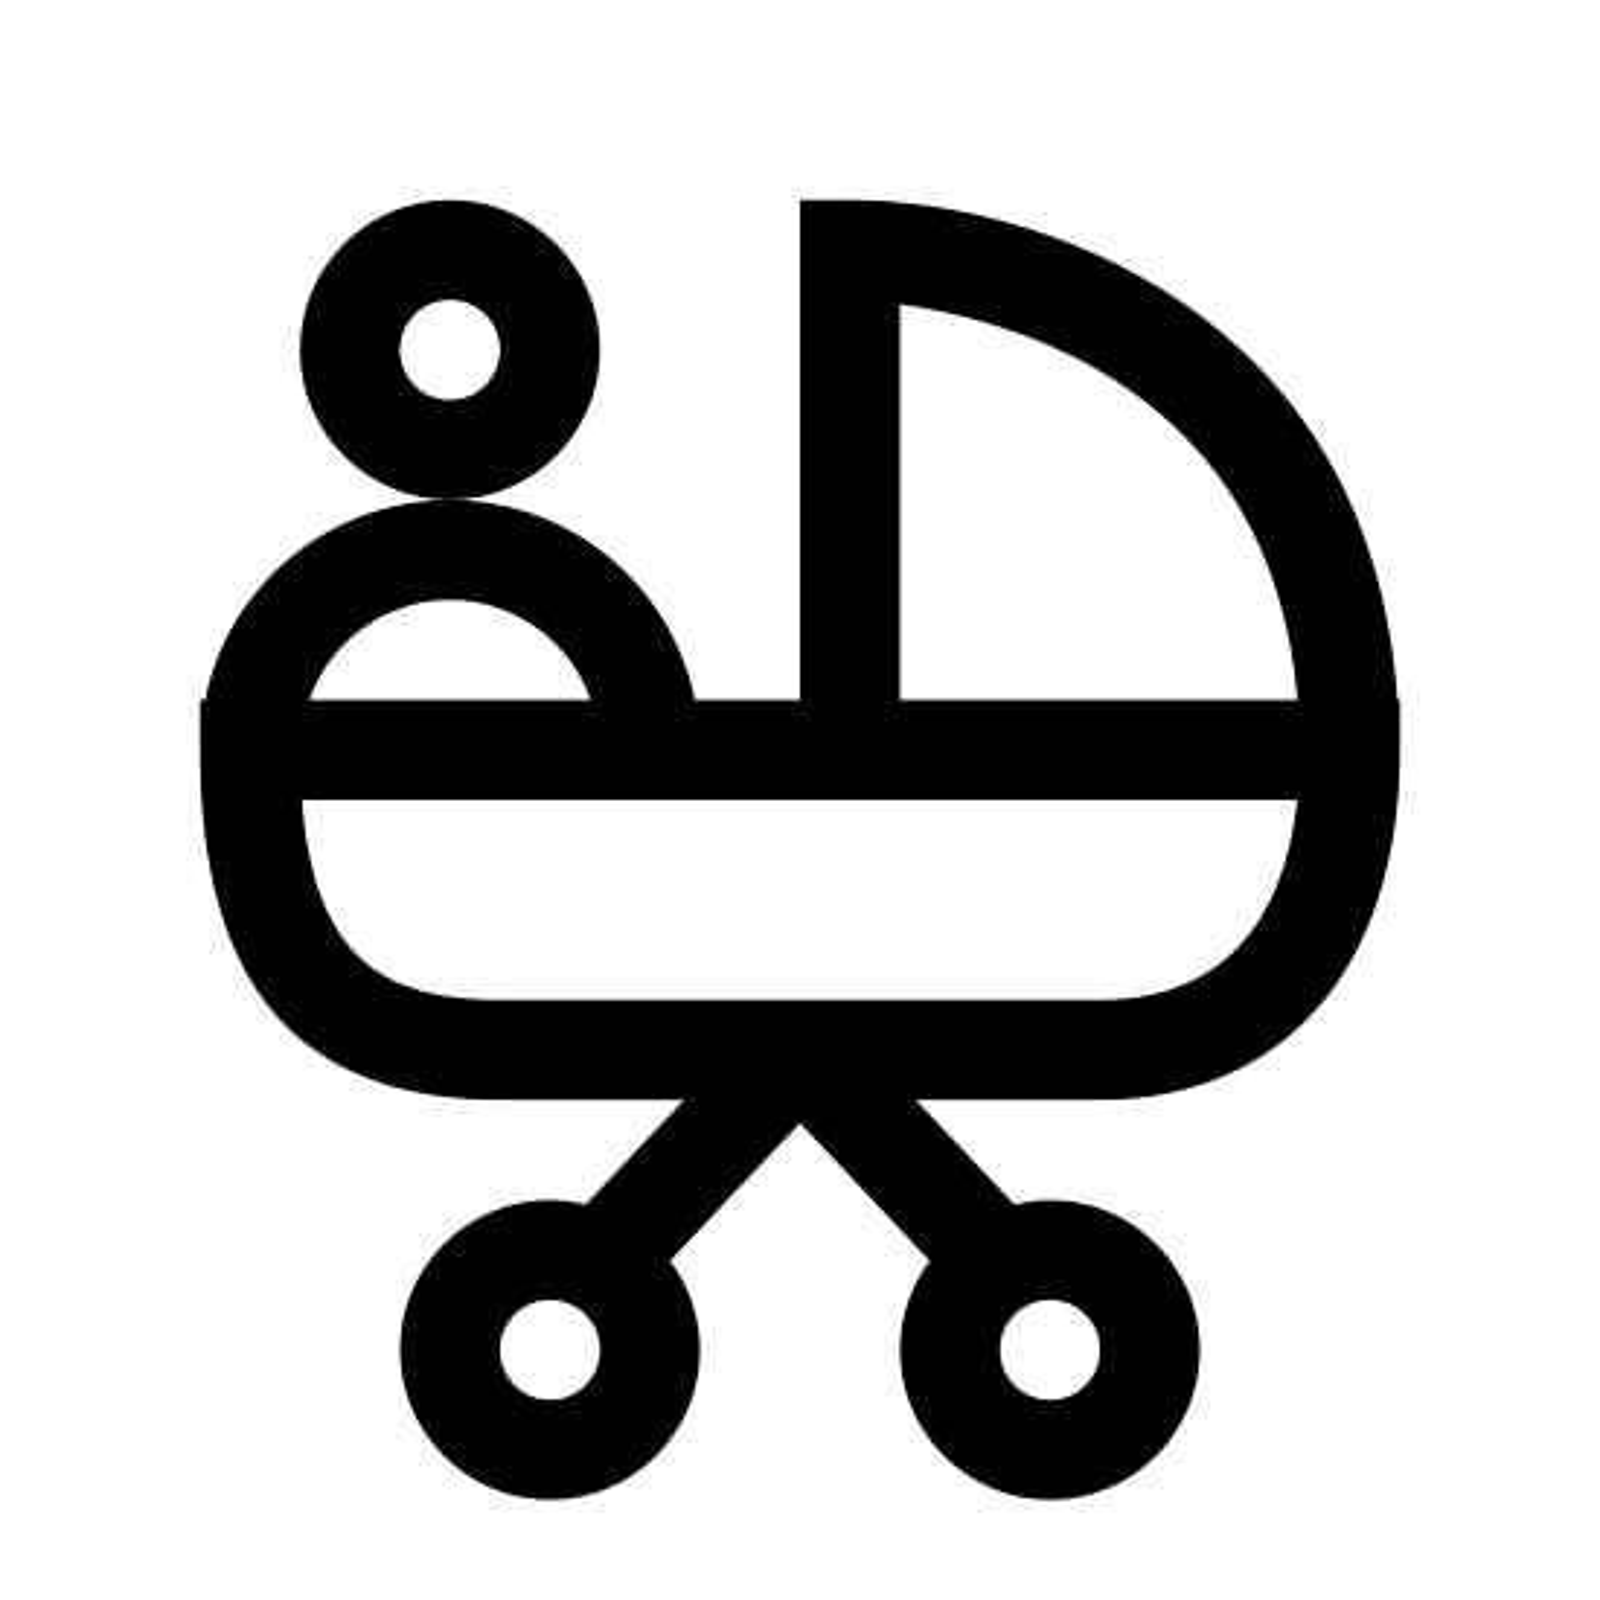 Poussette icon